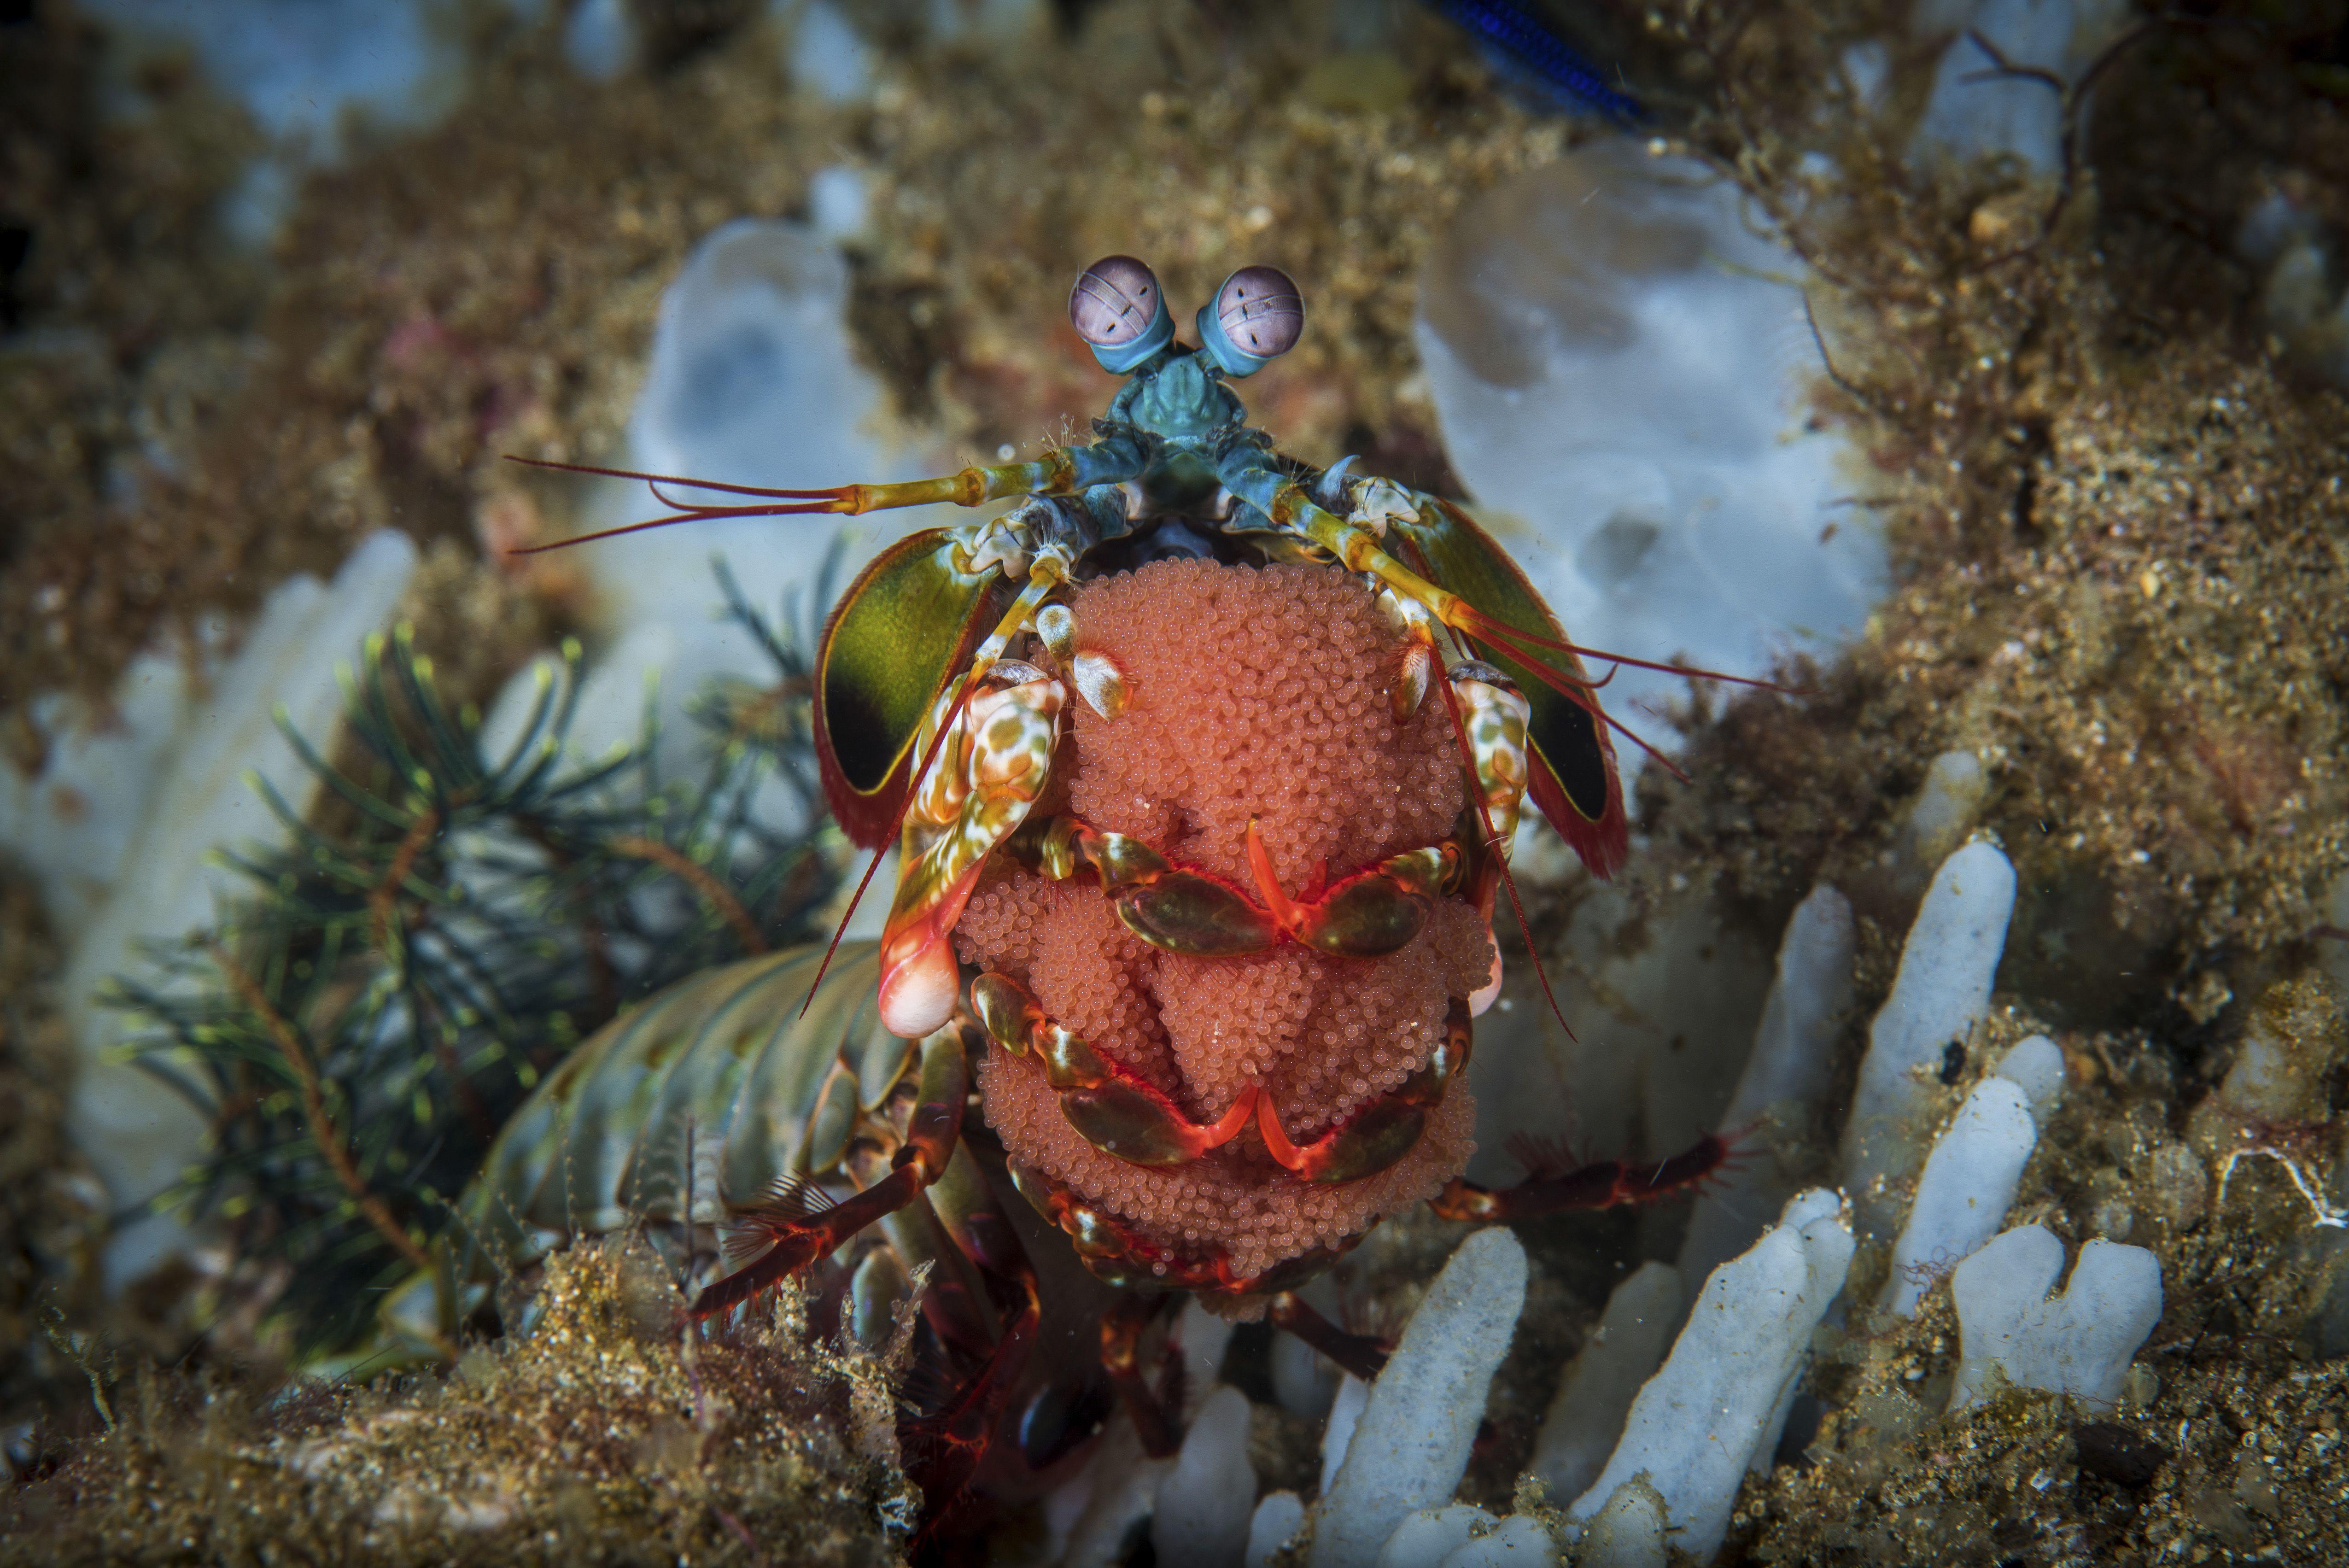 A peacock mantis shrimp carrying its egg ribbon, Anilao, Philippines.